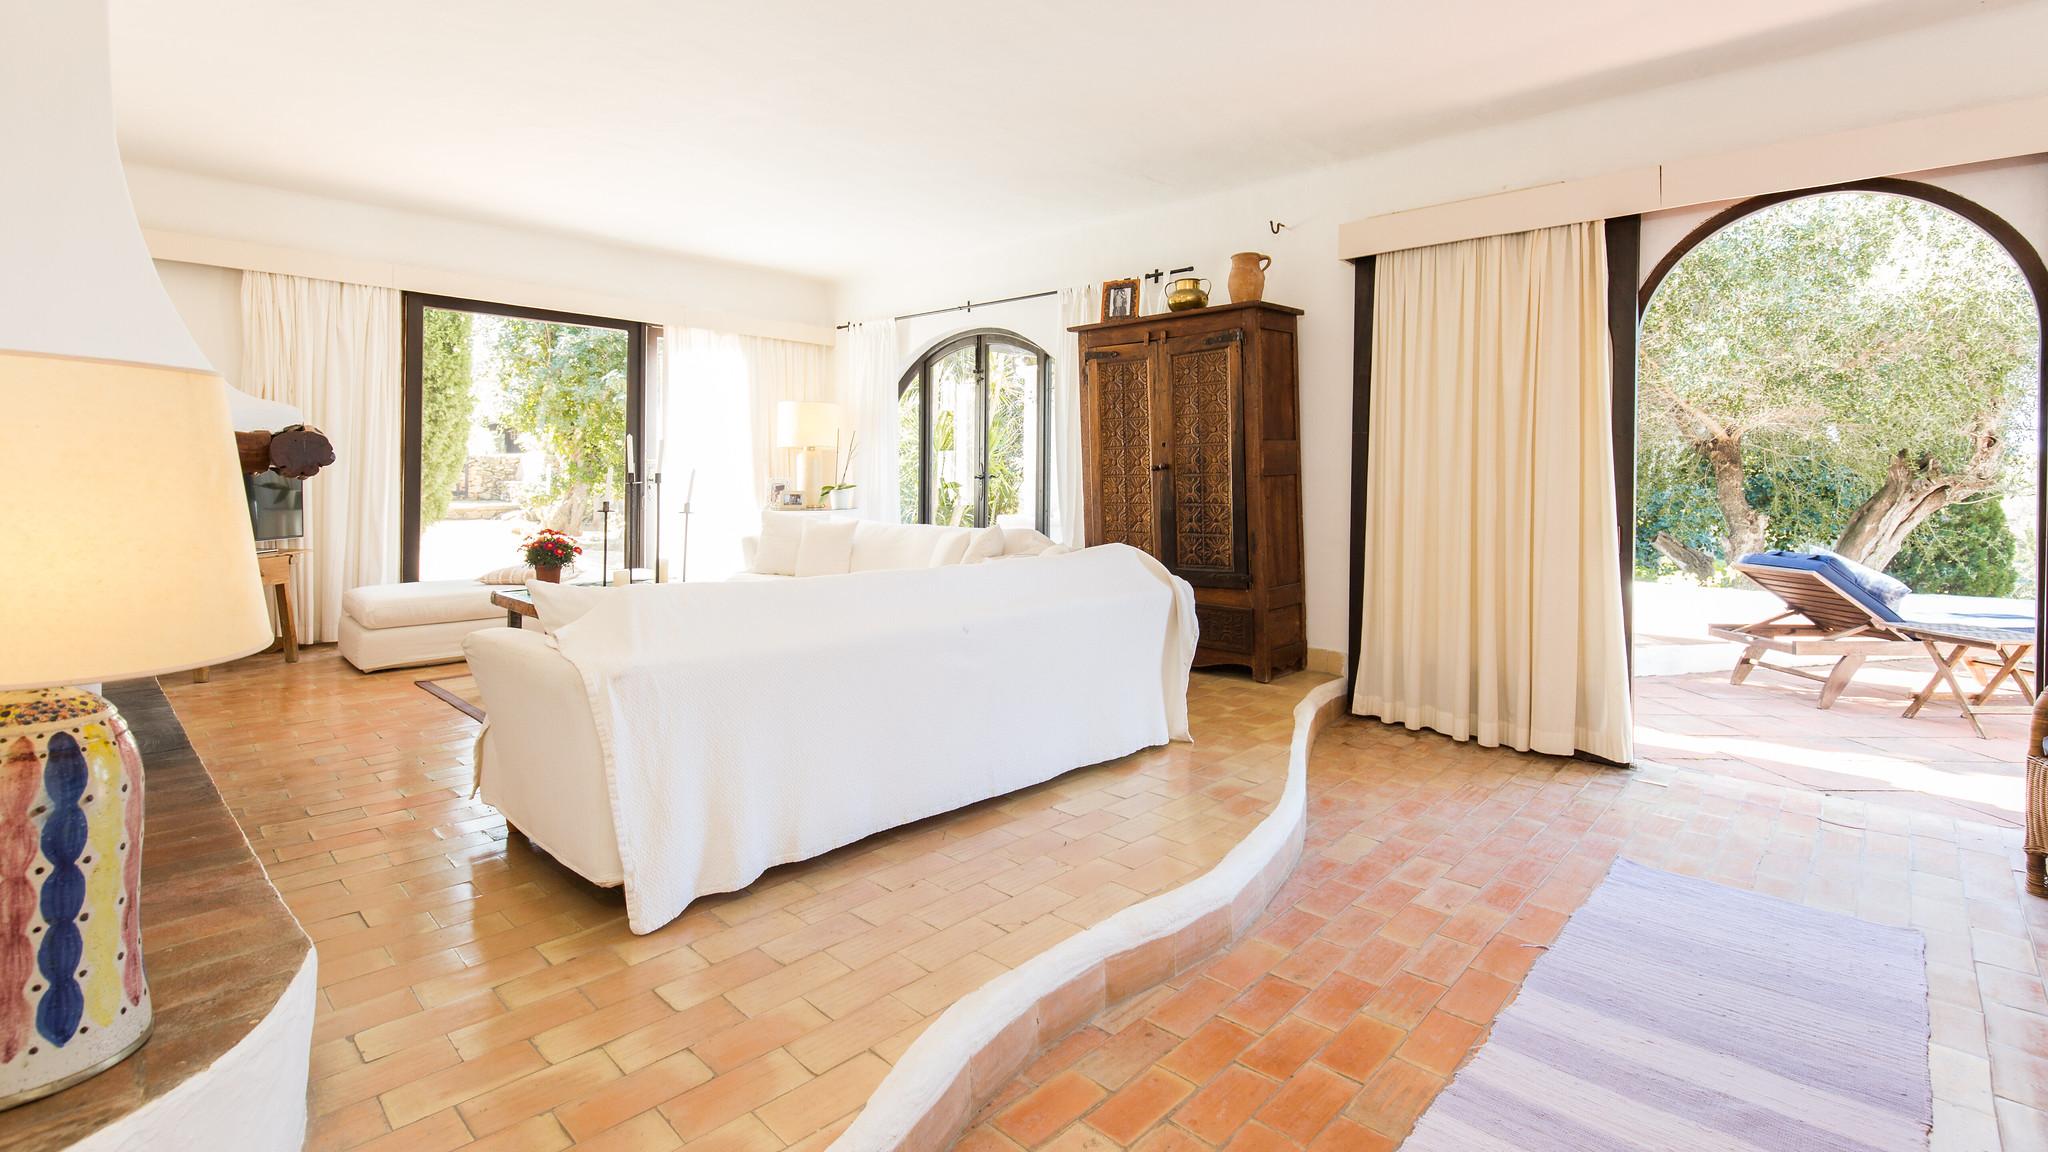 https://www.white-ibiza.com/wp-content/uploads/2020/05/white-ibiza-villas-can-amelida-interior-living-room.jpg